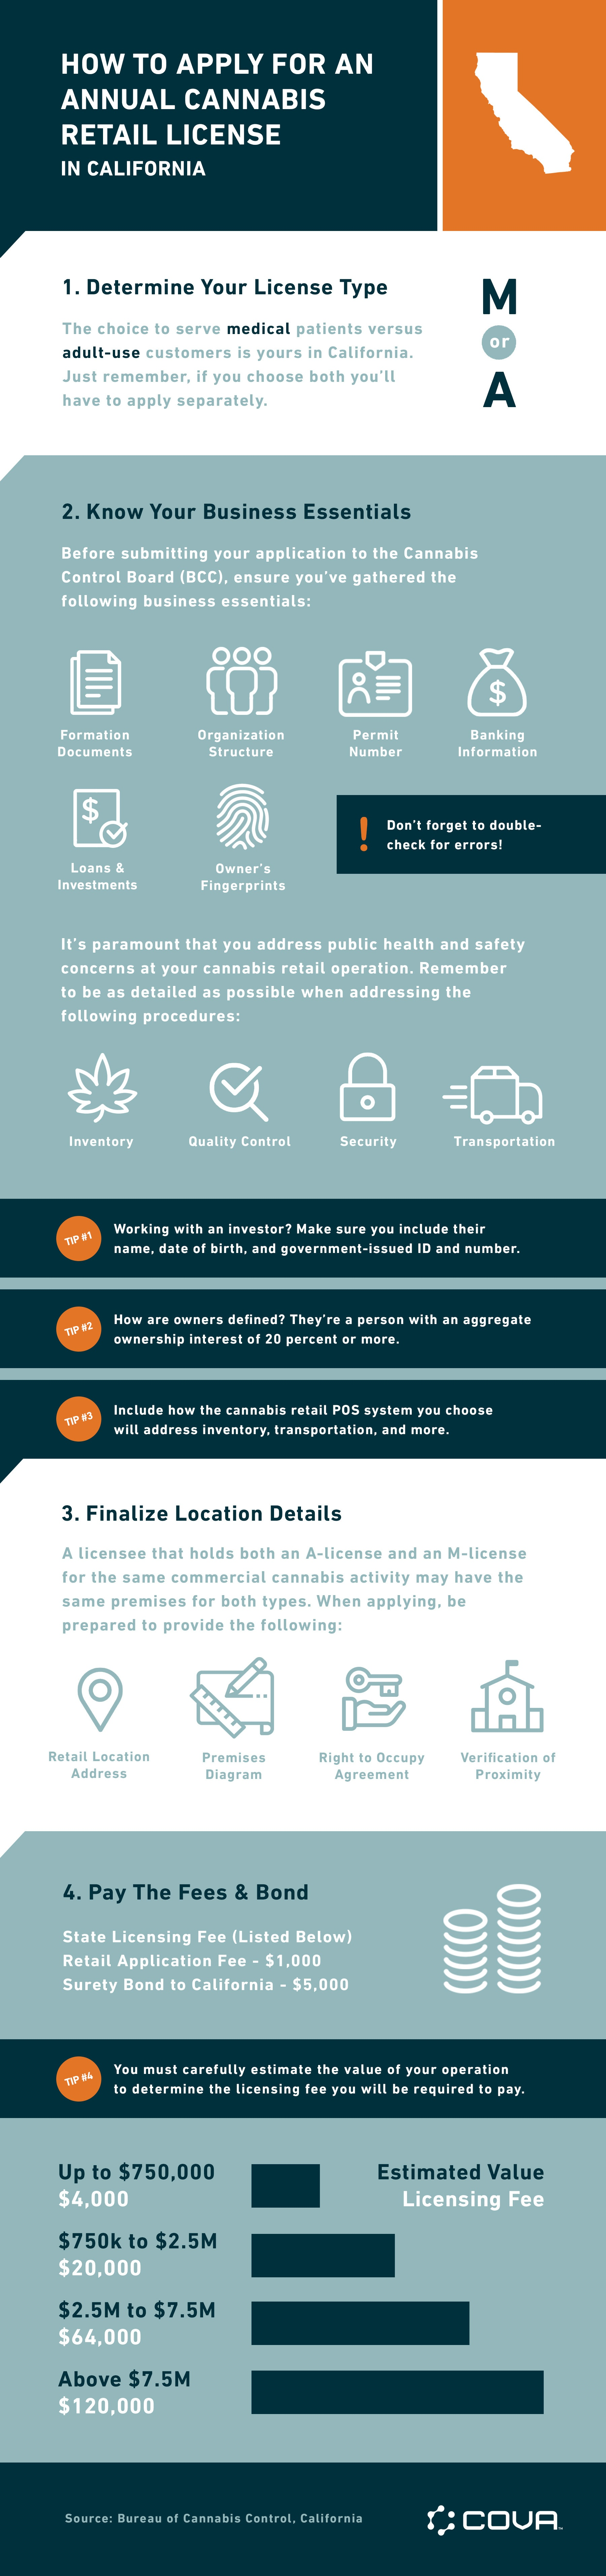 Cova-Cannabis-Retail-Annual-Application-Infographic-update-june-18.jpg